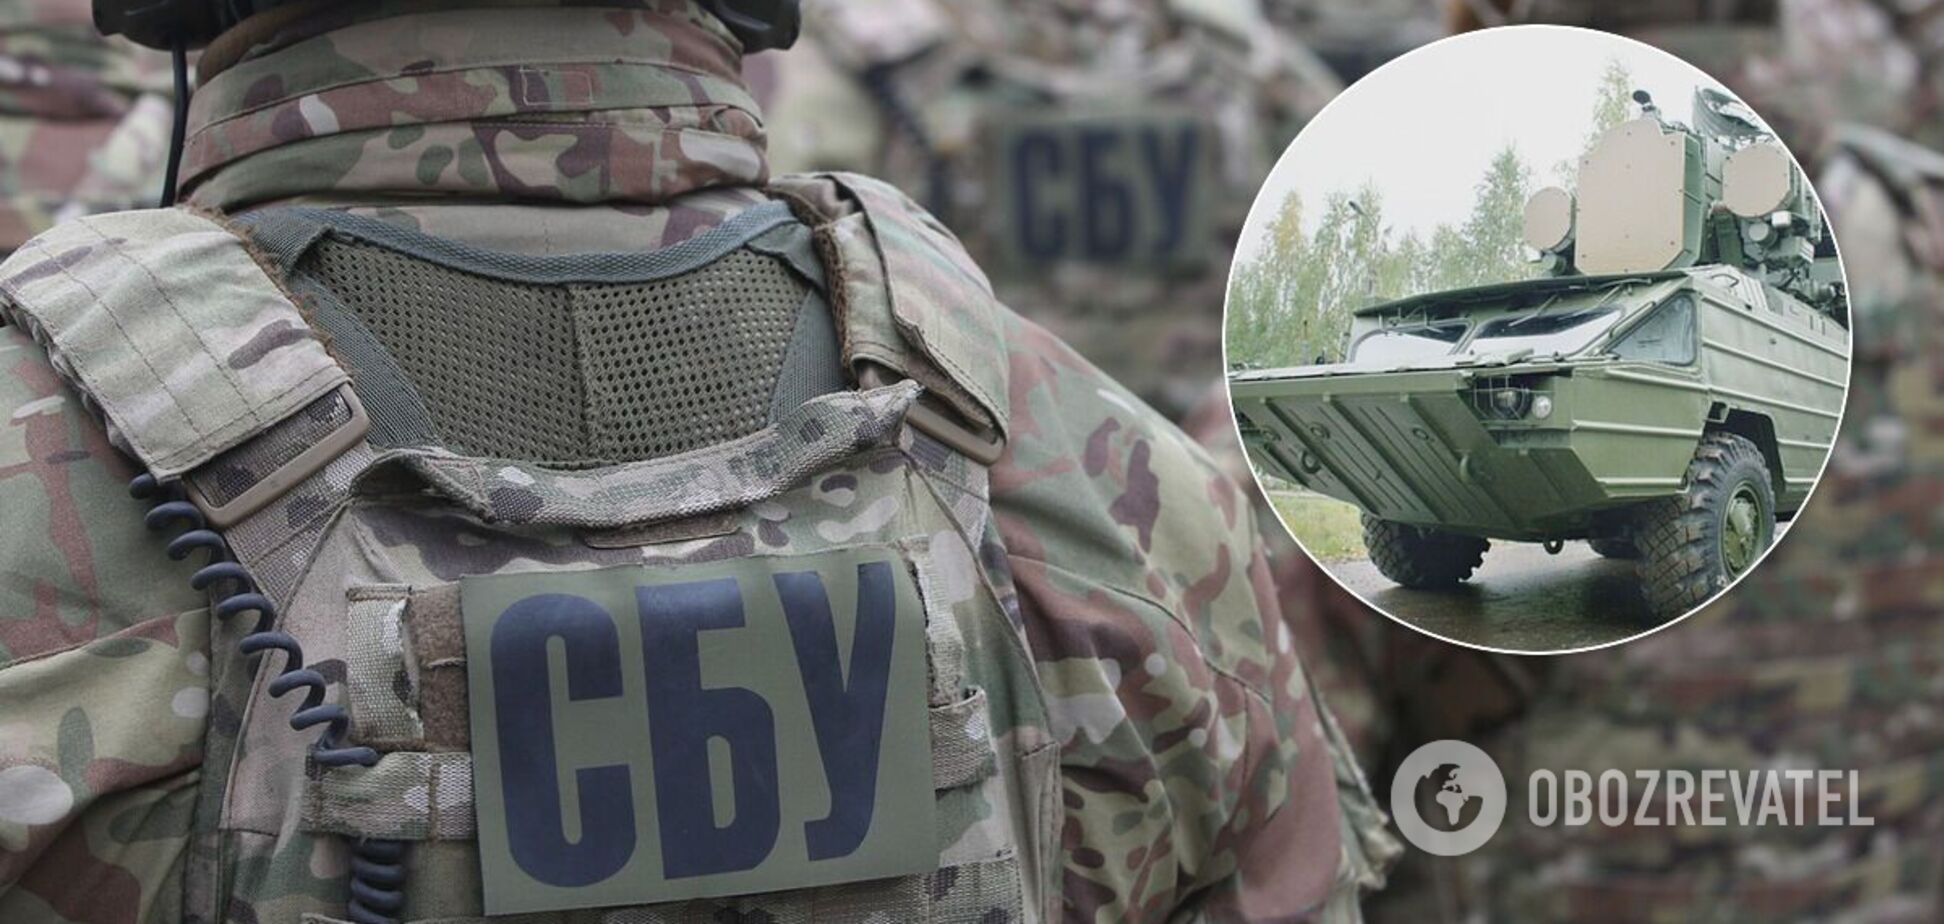 З України хотіли вивезти складові ракетного комплексу 'Оса-АКМ'. Фото